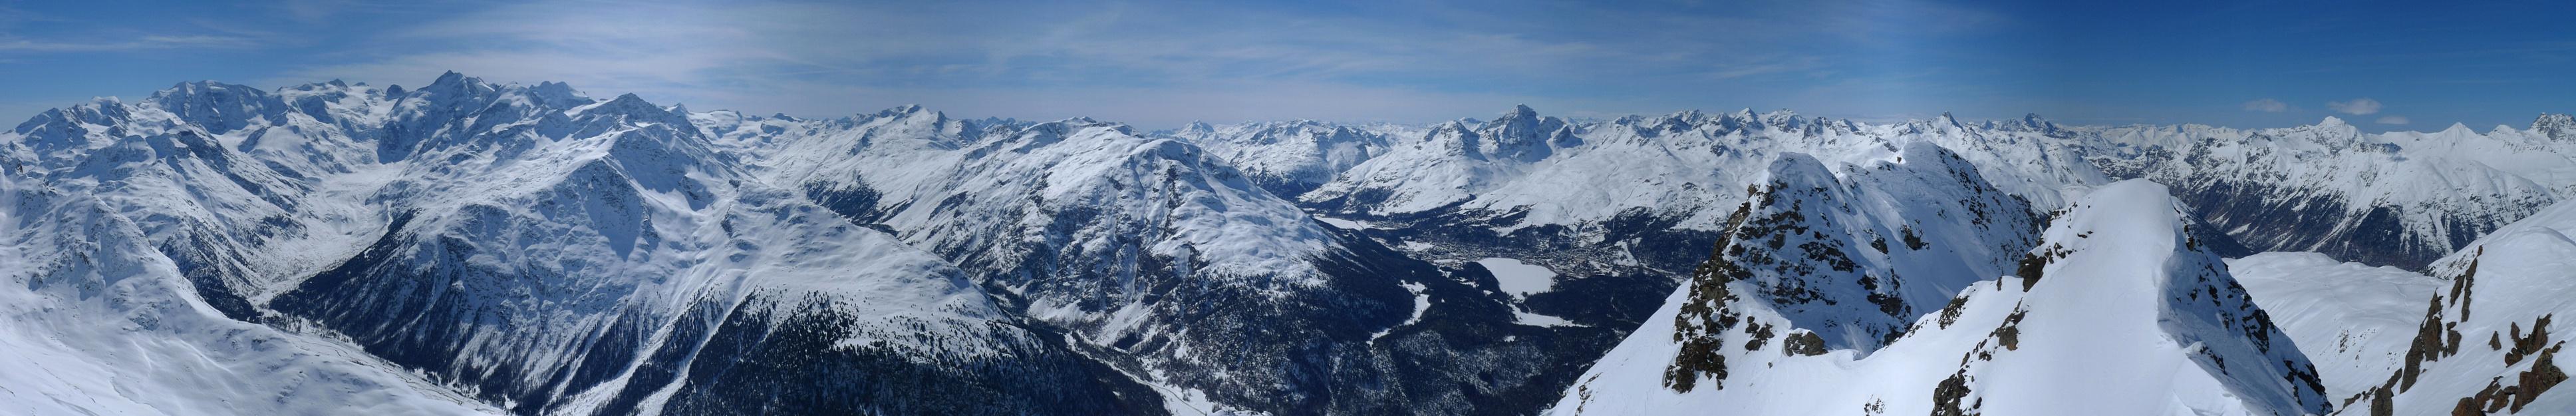 Piz Muragl Albula Alpen Švýcarsko panorama 30